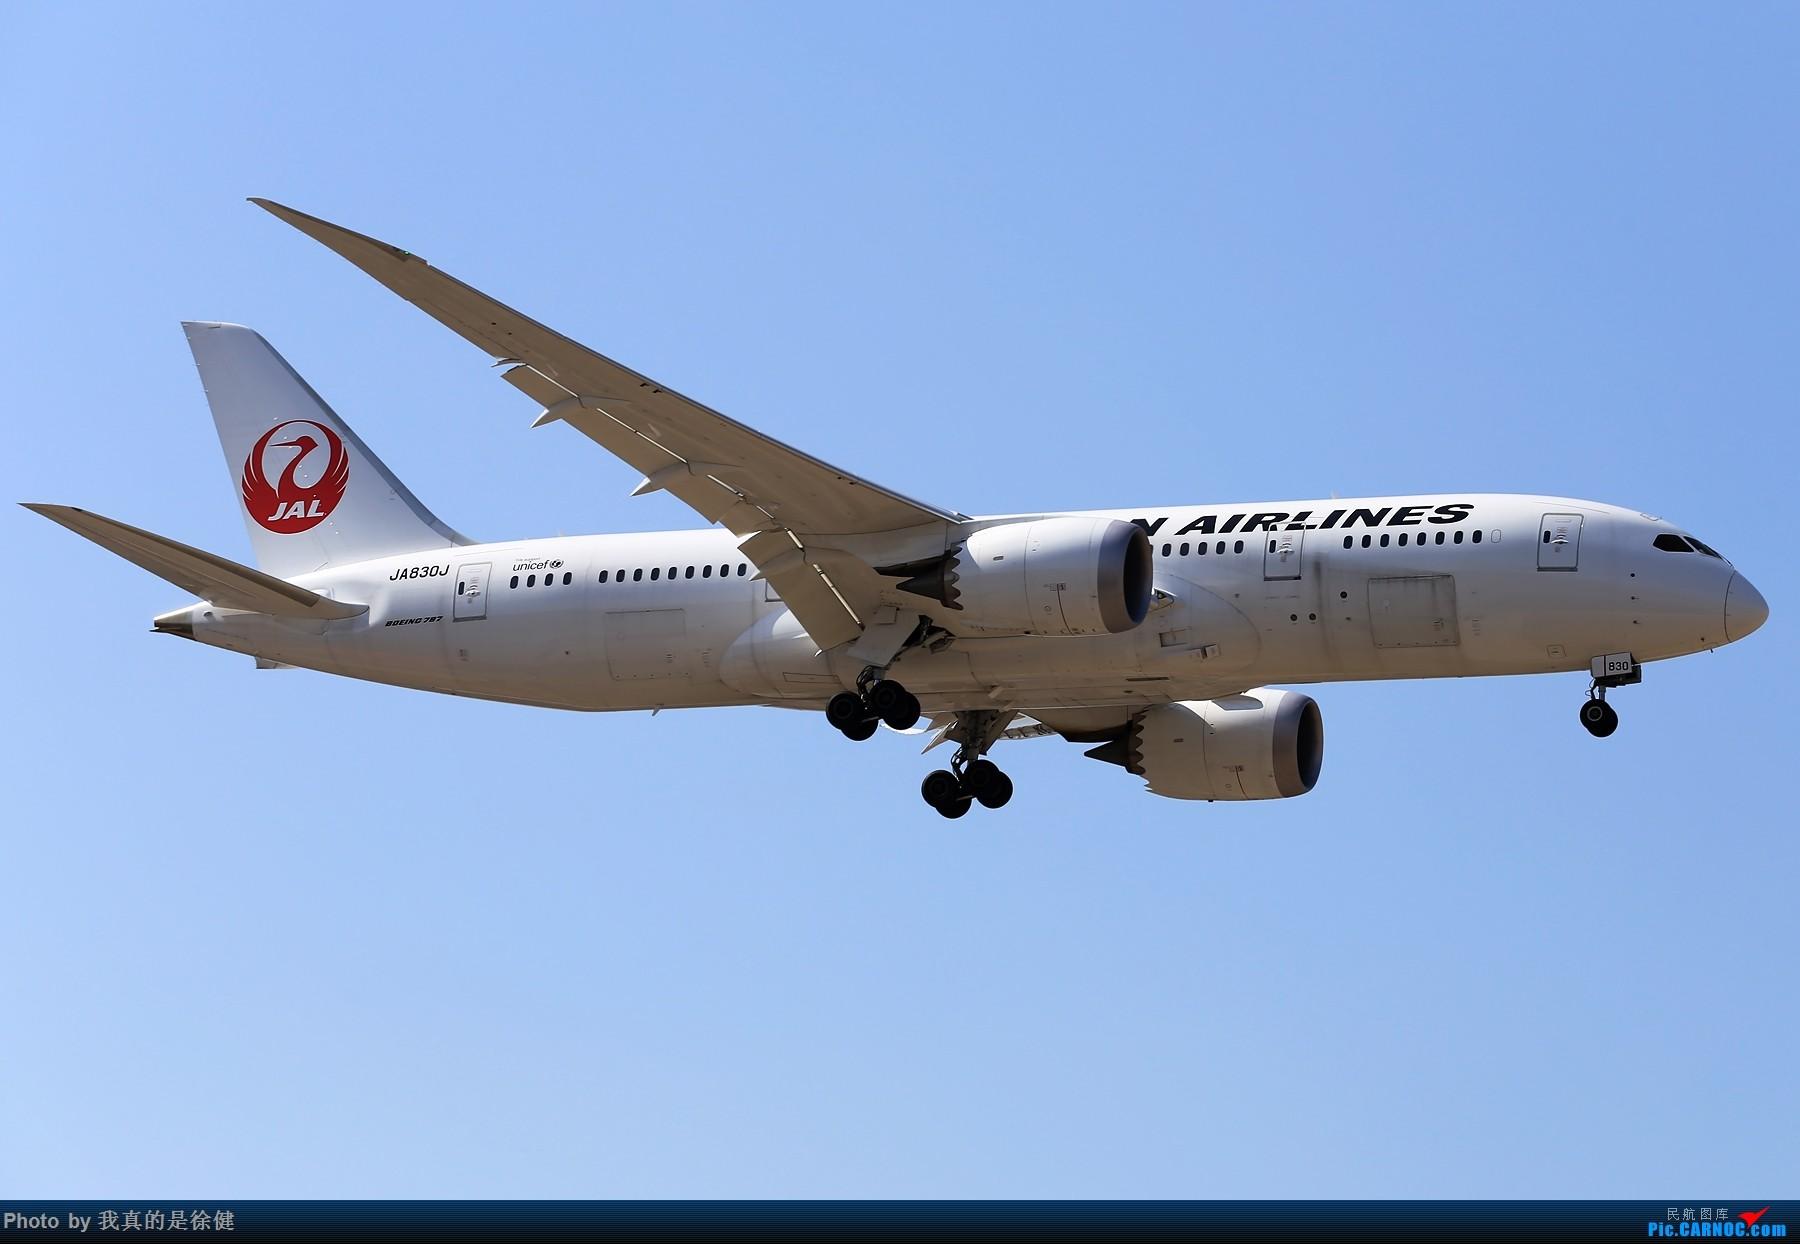 Re:[原创]【多图党】1800x1200 来一组Boeing787 PEK/ZBAA的日常 BOEING 787-8 JA830J 中国北京首都国际机场